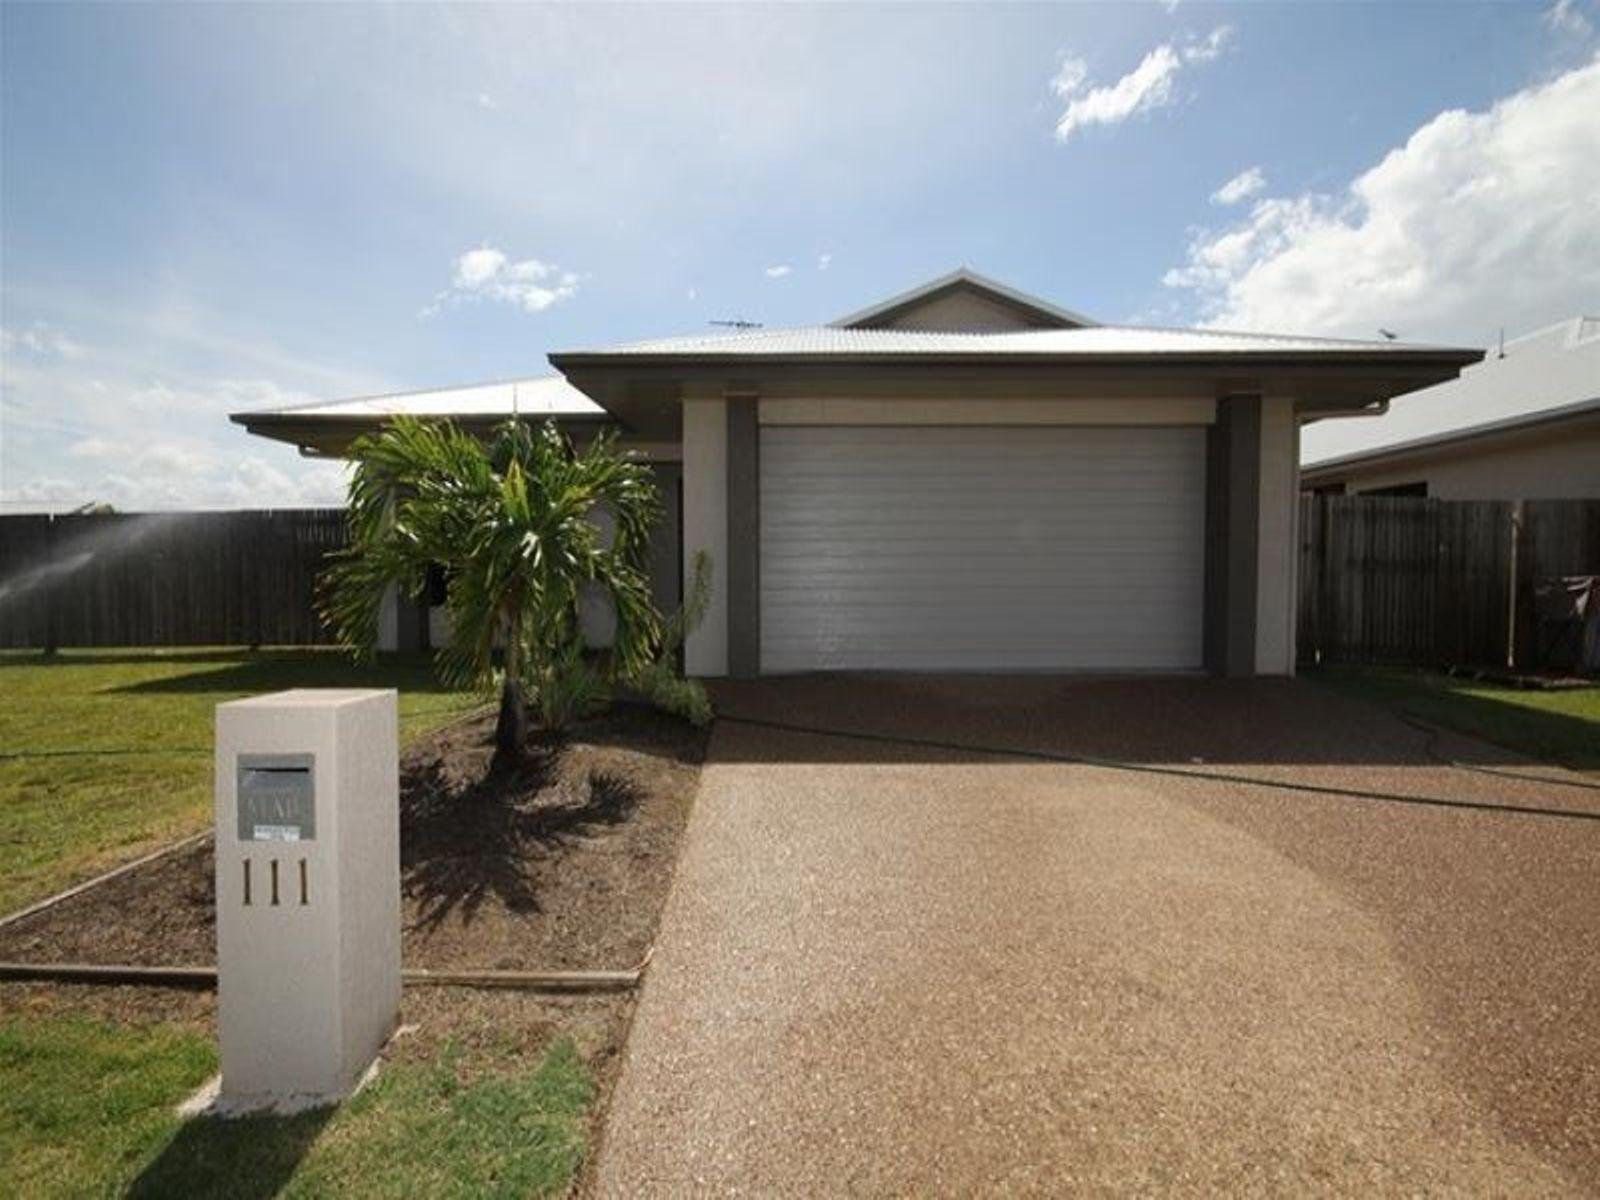 111 Daintree Drive, Bushland Beach, QLD 4818